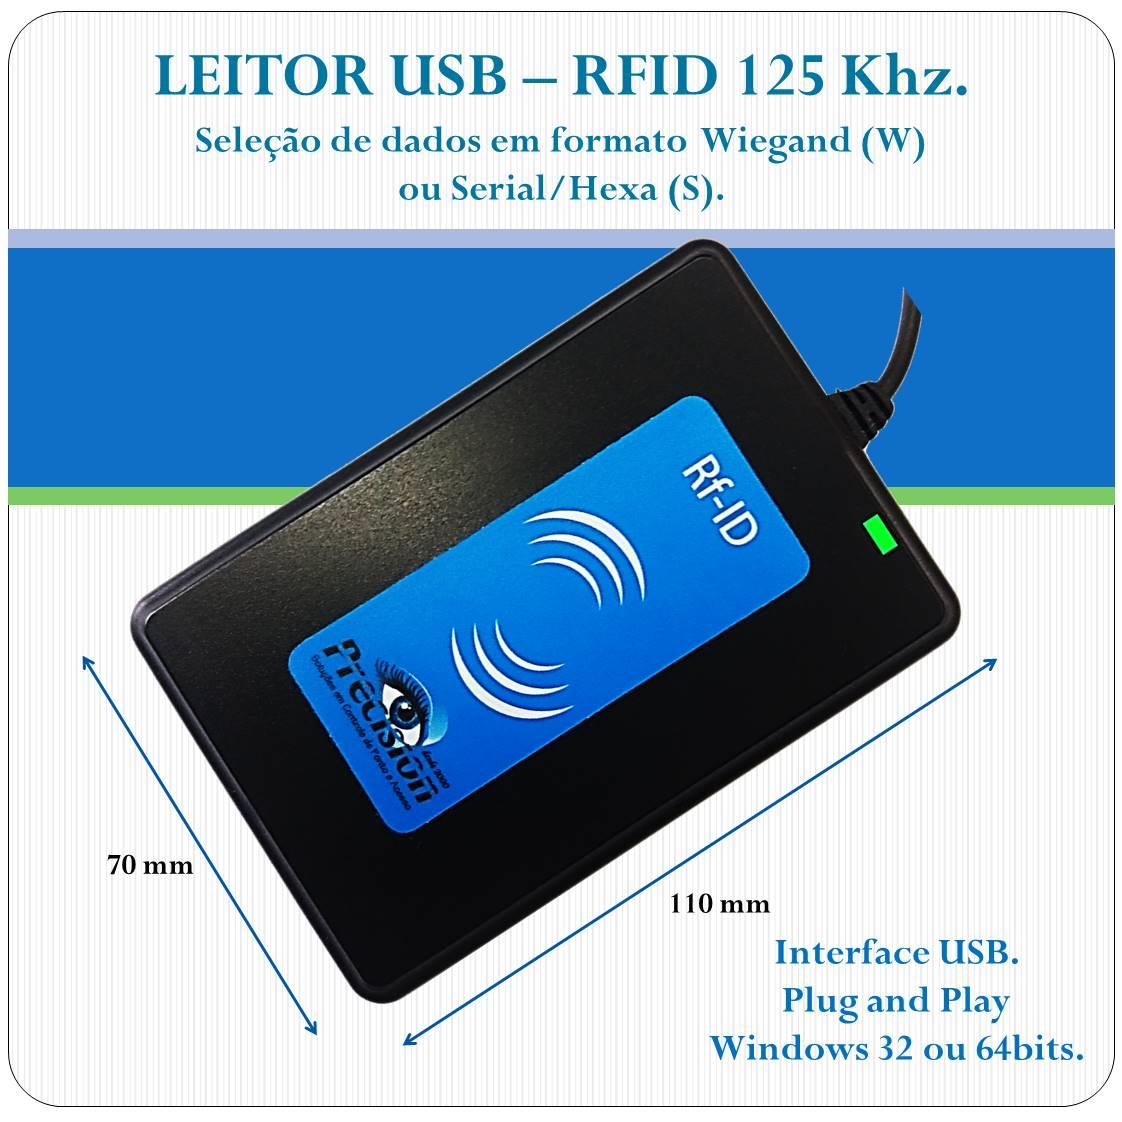 Leitor RFID proximidade USB - U125-WS - 125Khz